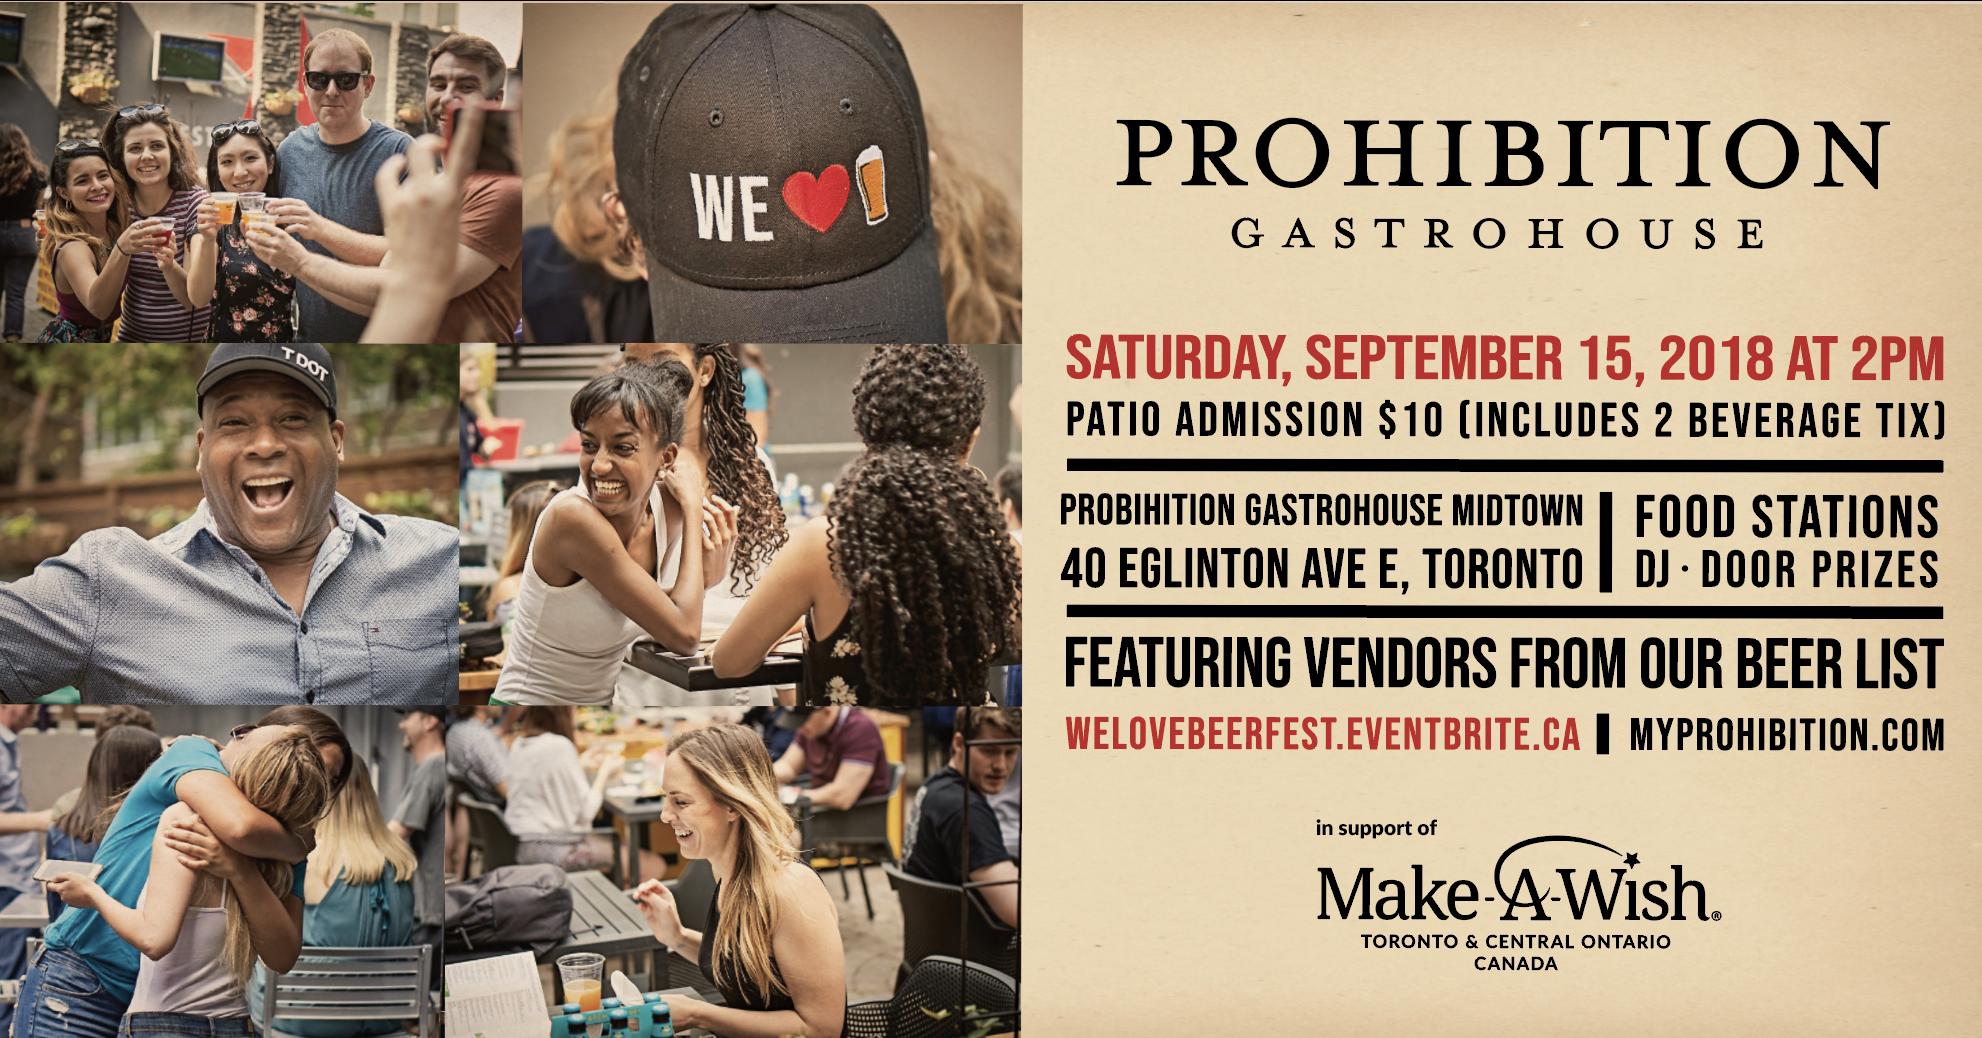 Prohibition Gastrohouse - WE LOVE BEER FEST, Toronto Beer Week 2018